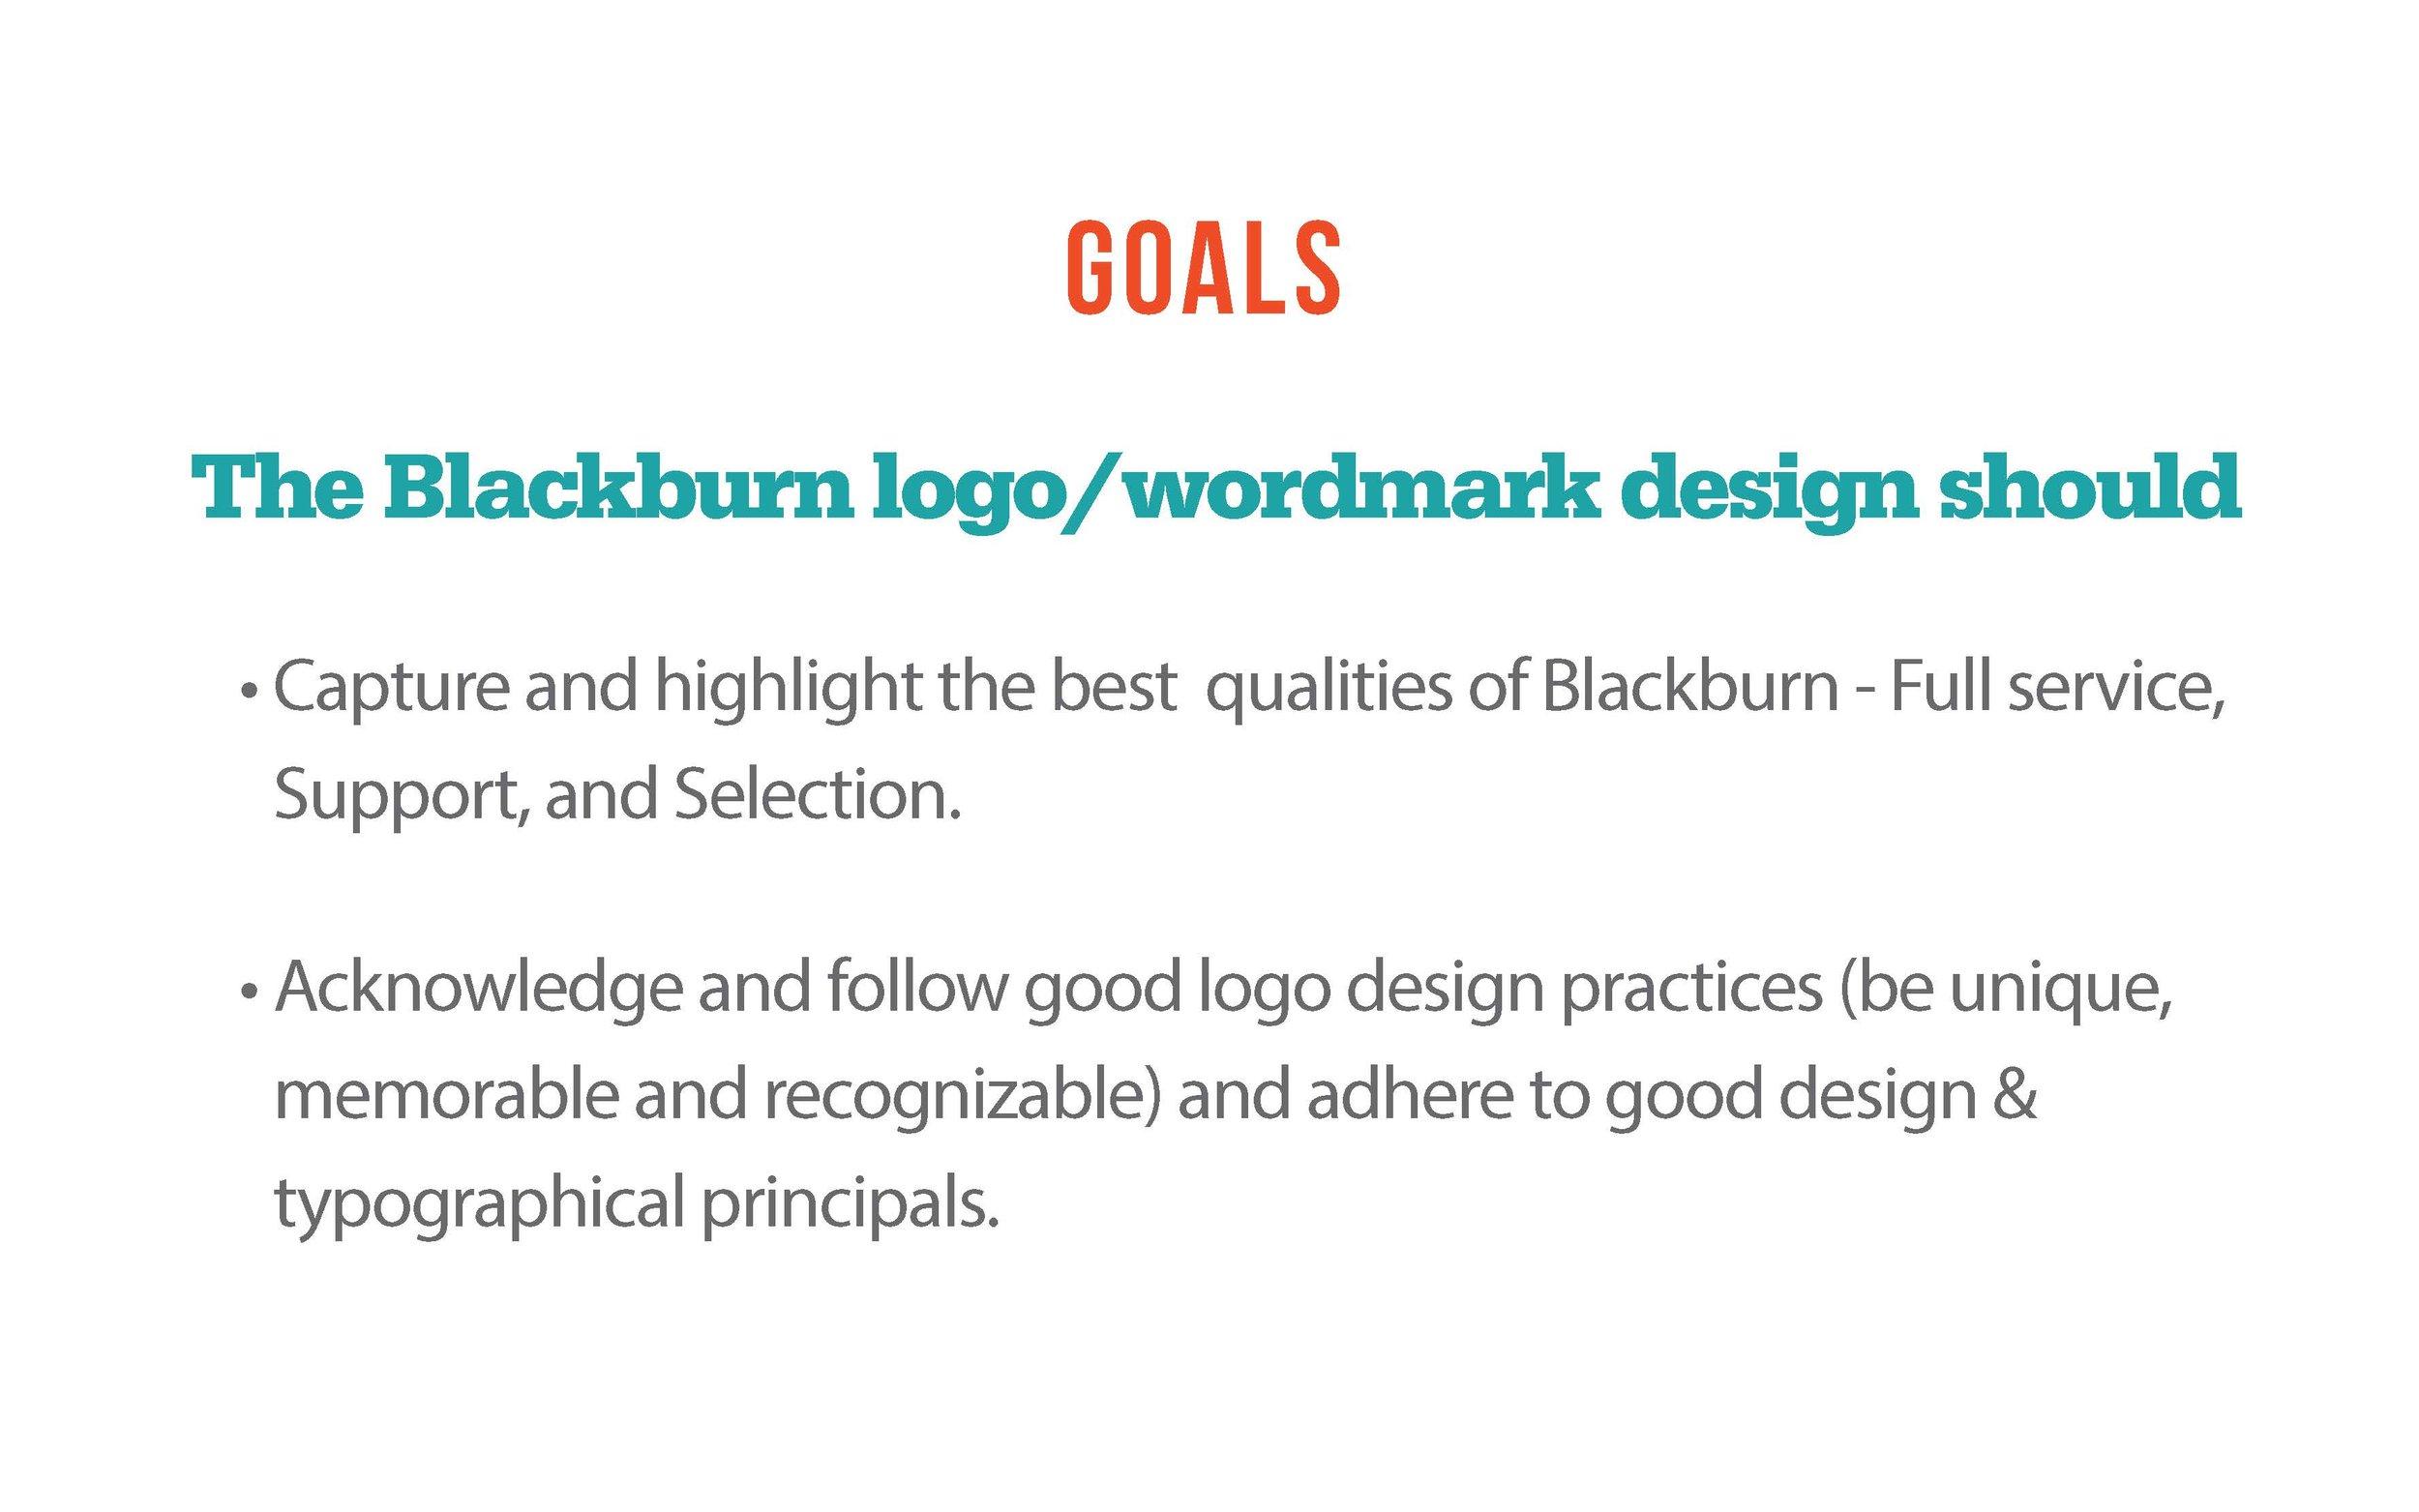 blkbrn-logo-rough-presentation-v1-max_Page_3.jpg